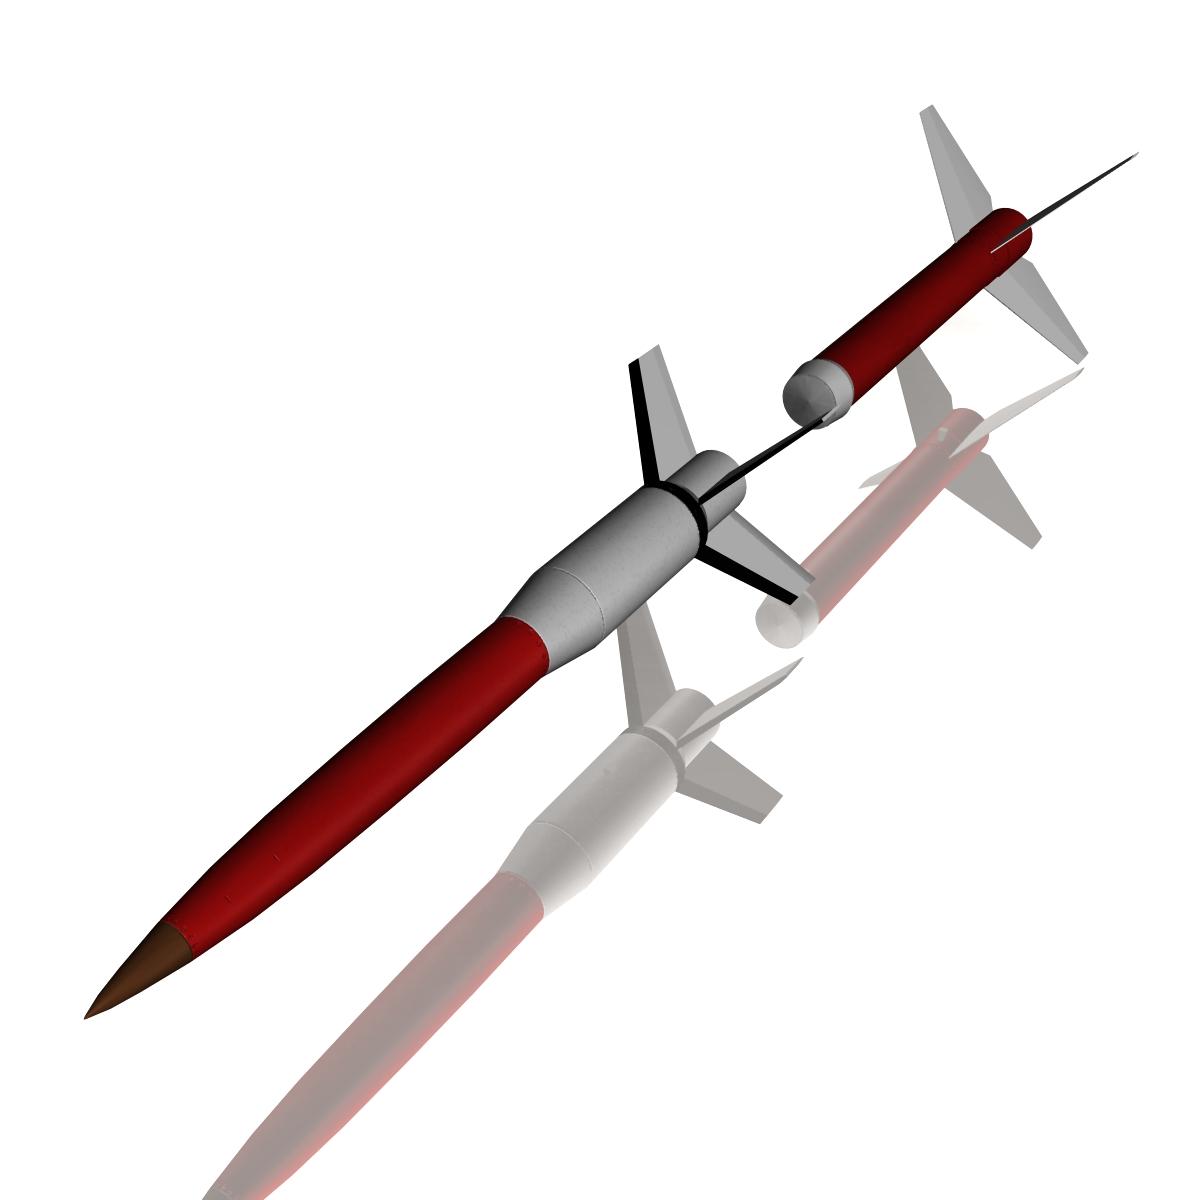 Astrobee 200 Rocket 3d model 3ds dxf fbx blend cob dae X   obj 165944